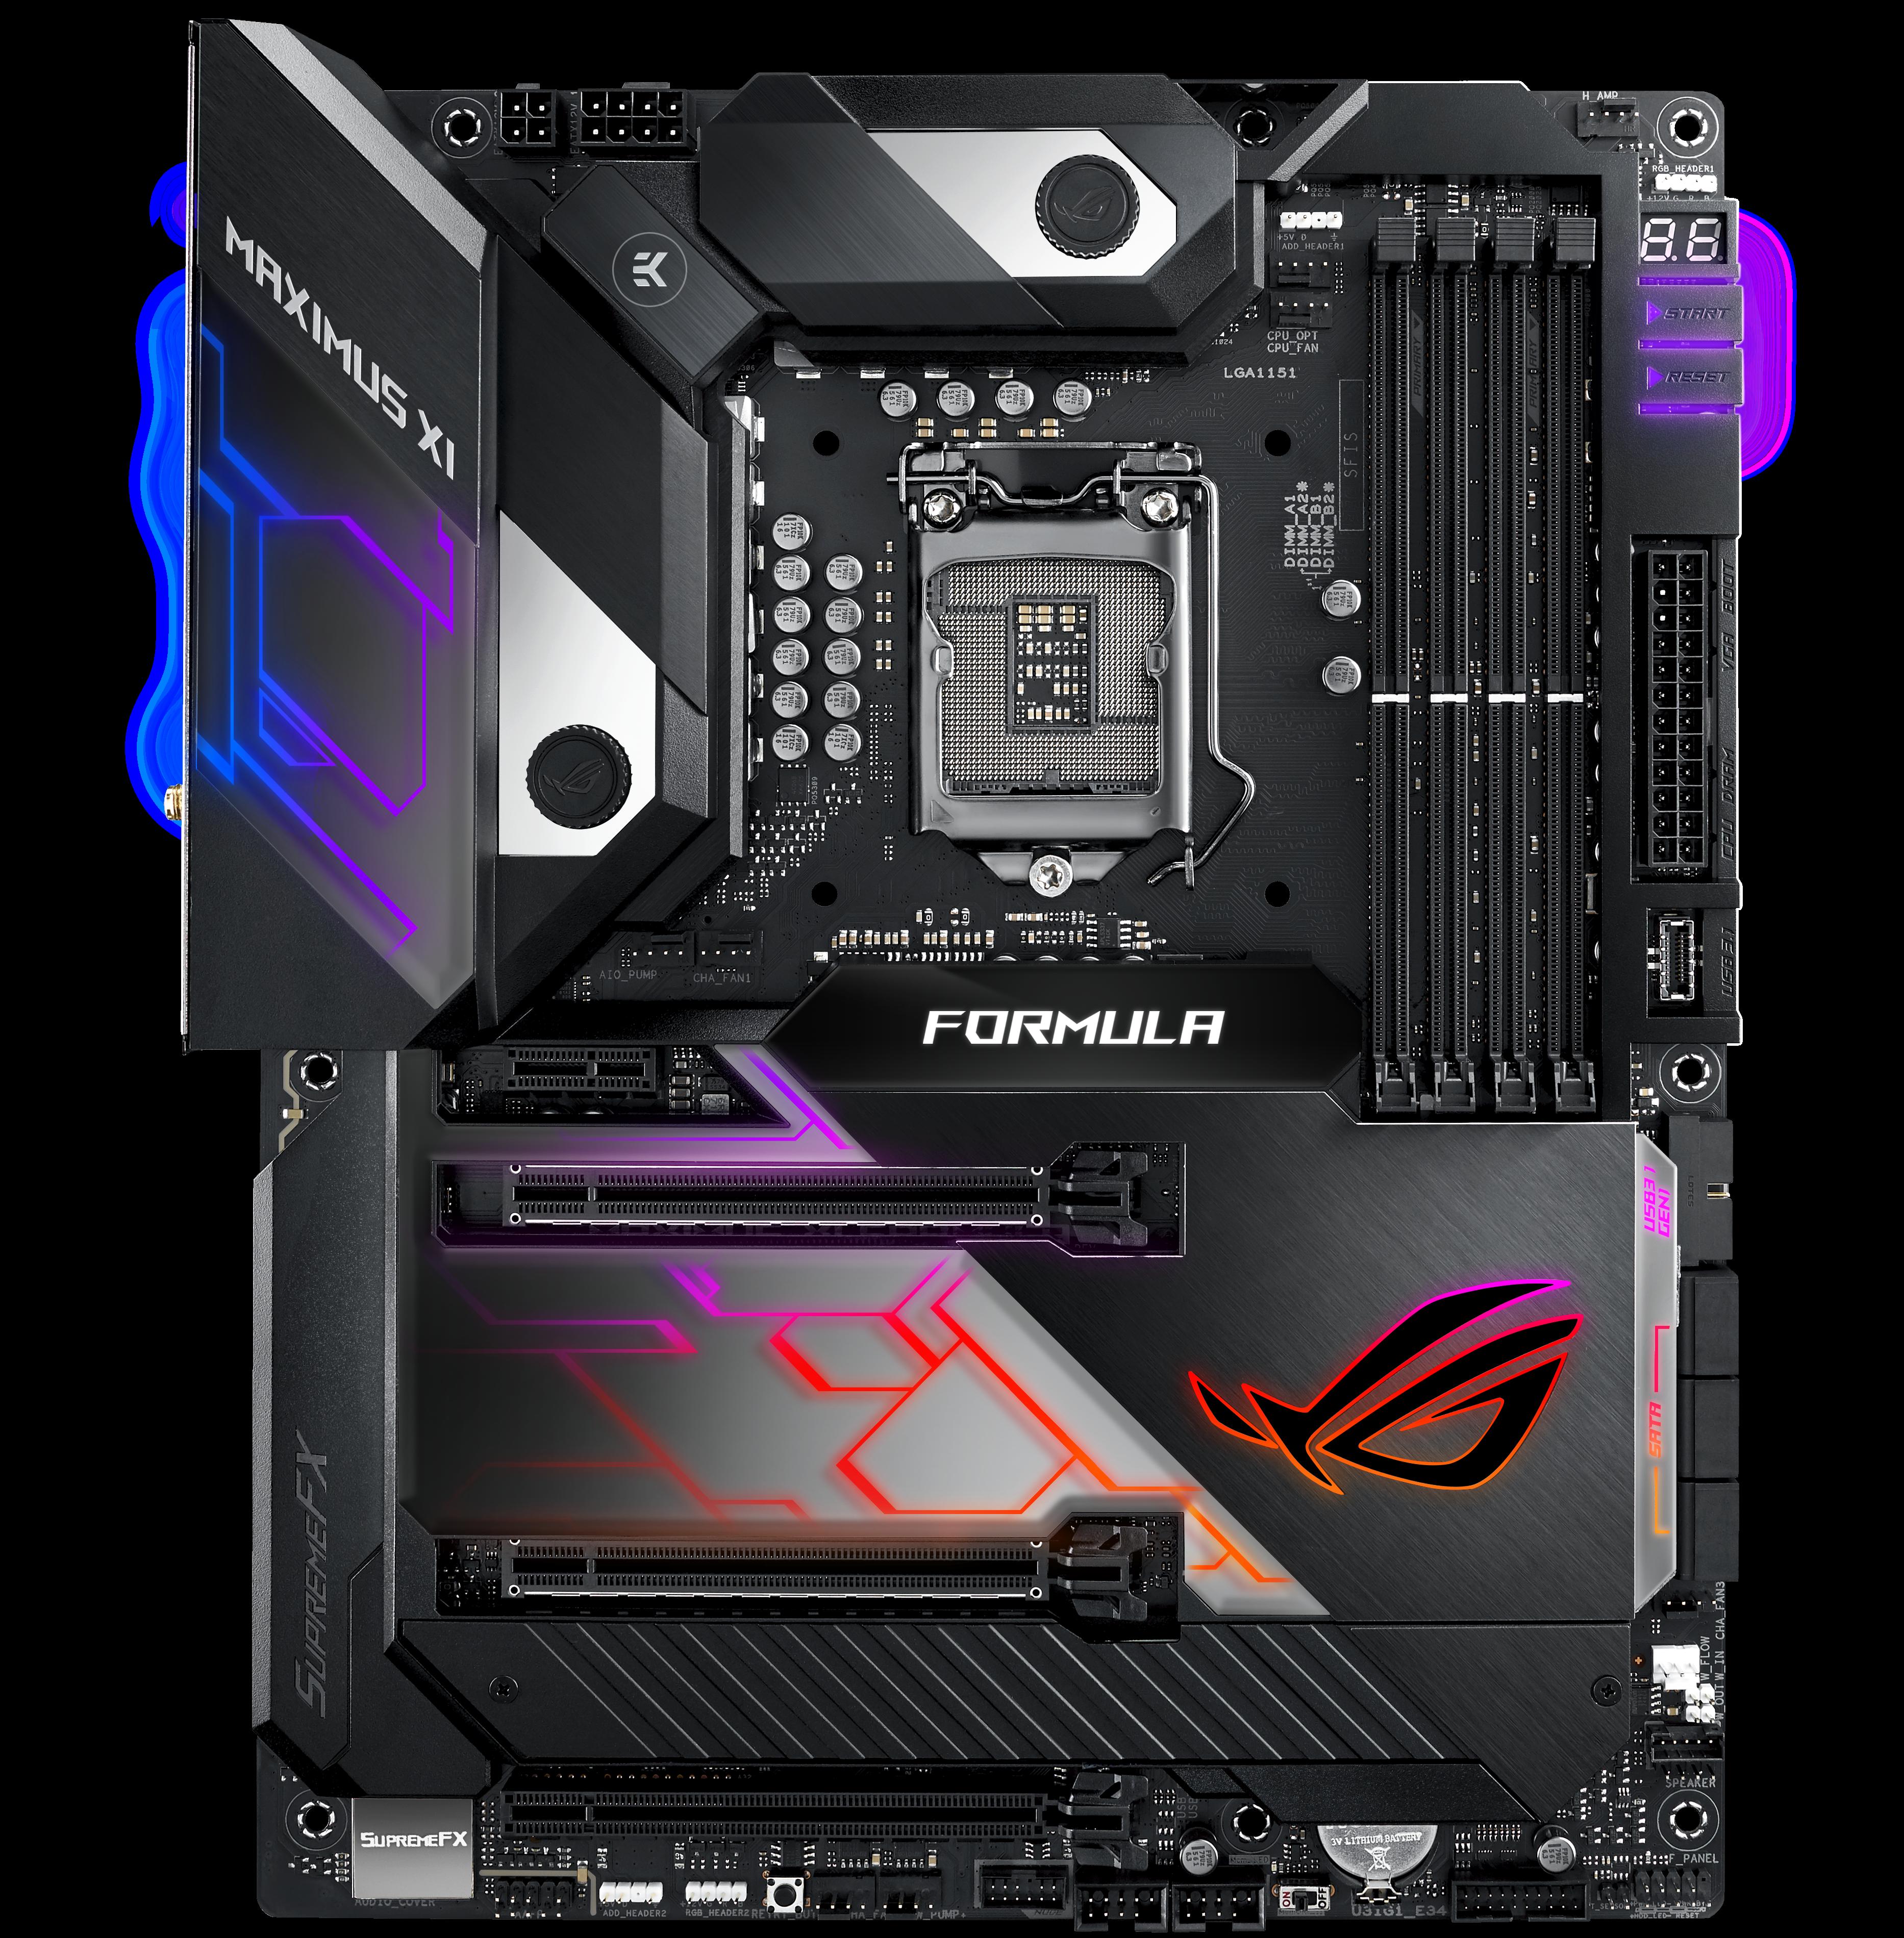 ASUS ROG Maximus XI Formula - Intel Z390 Motherboard Overview: 50+